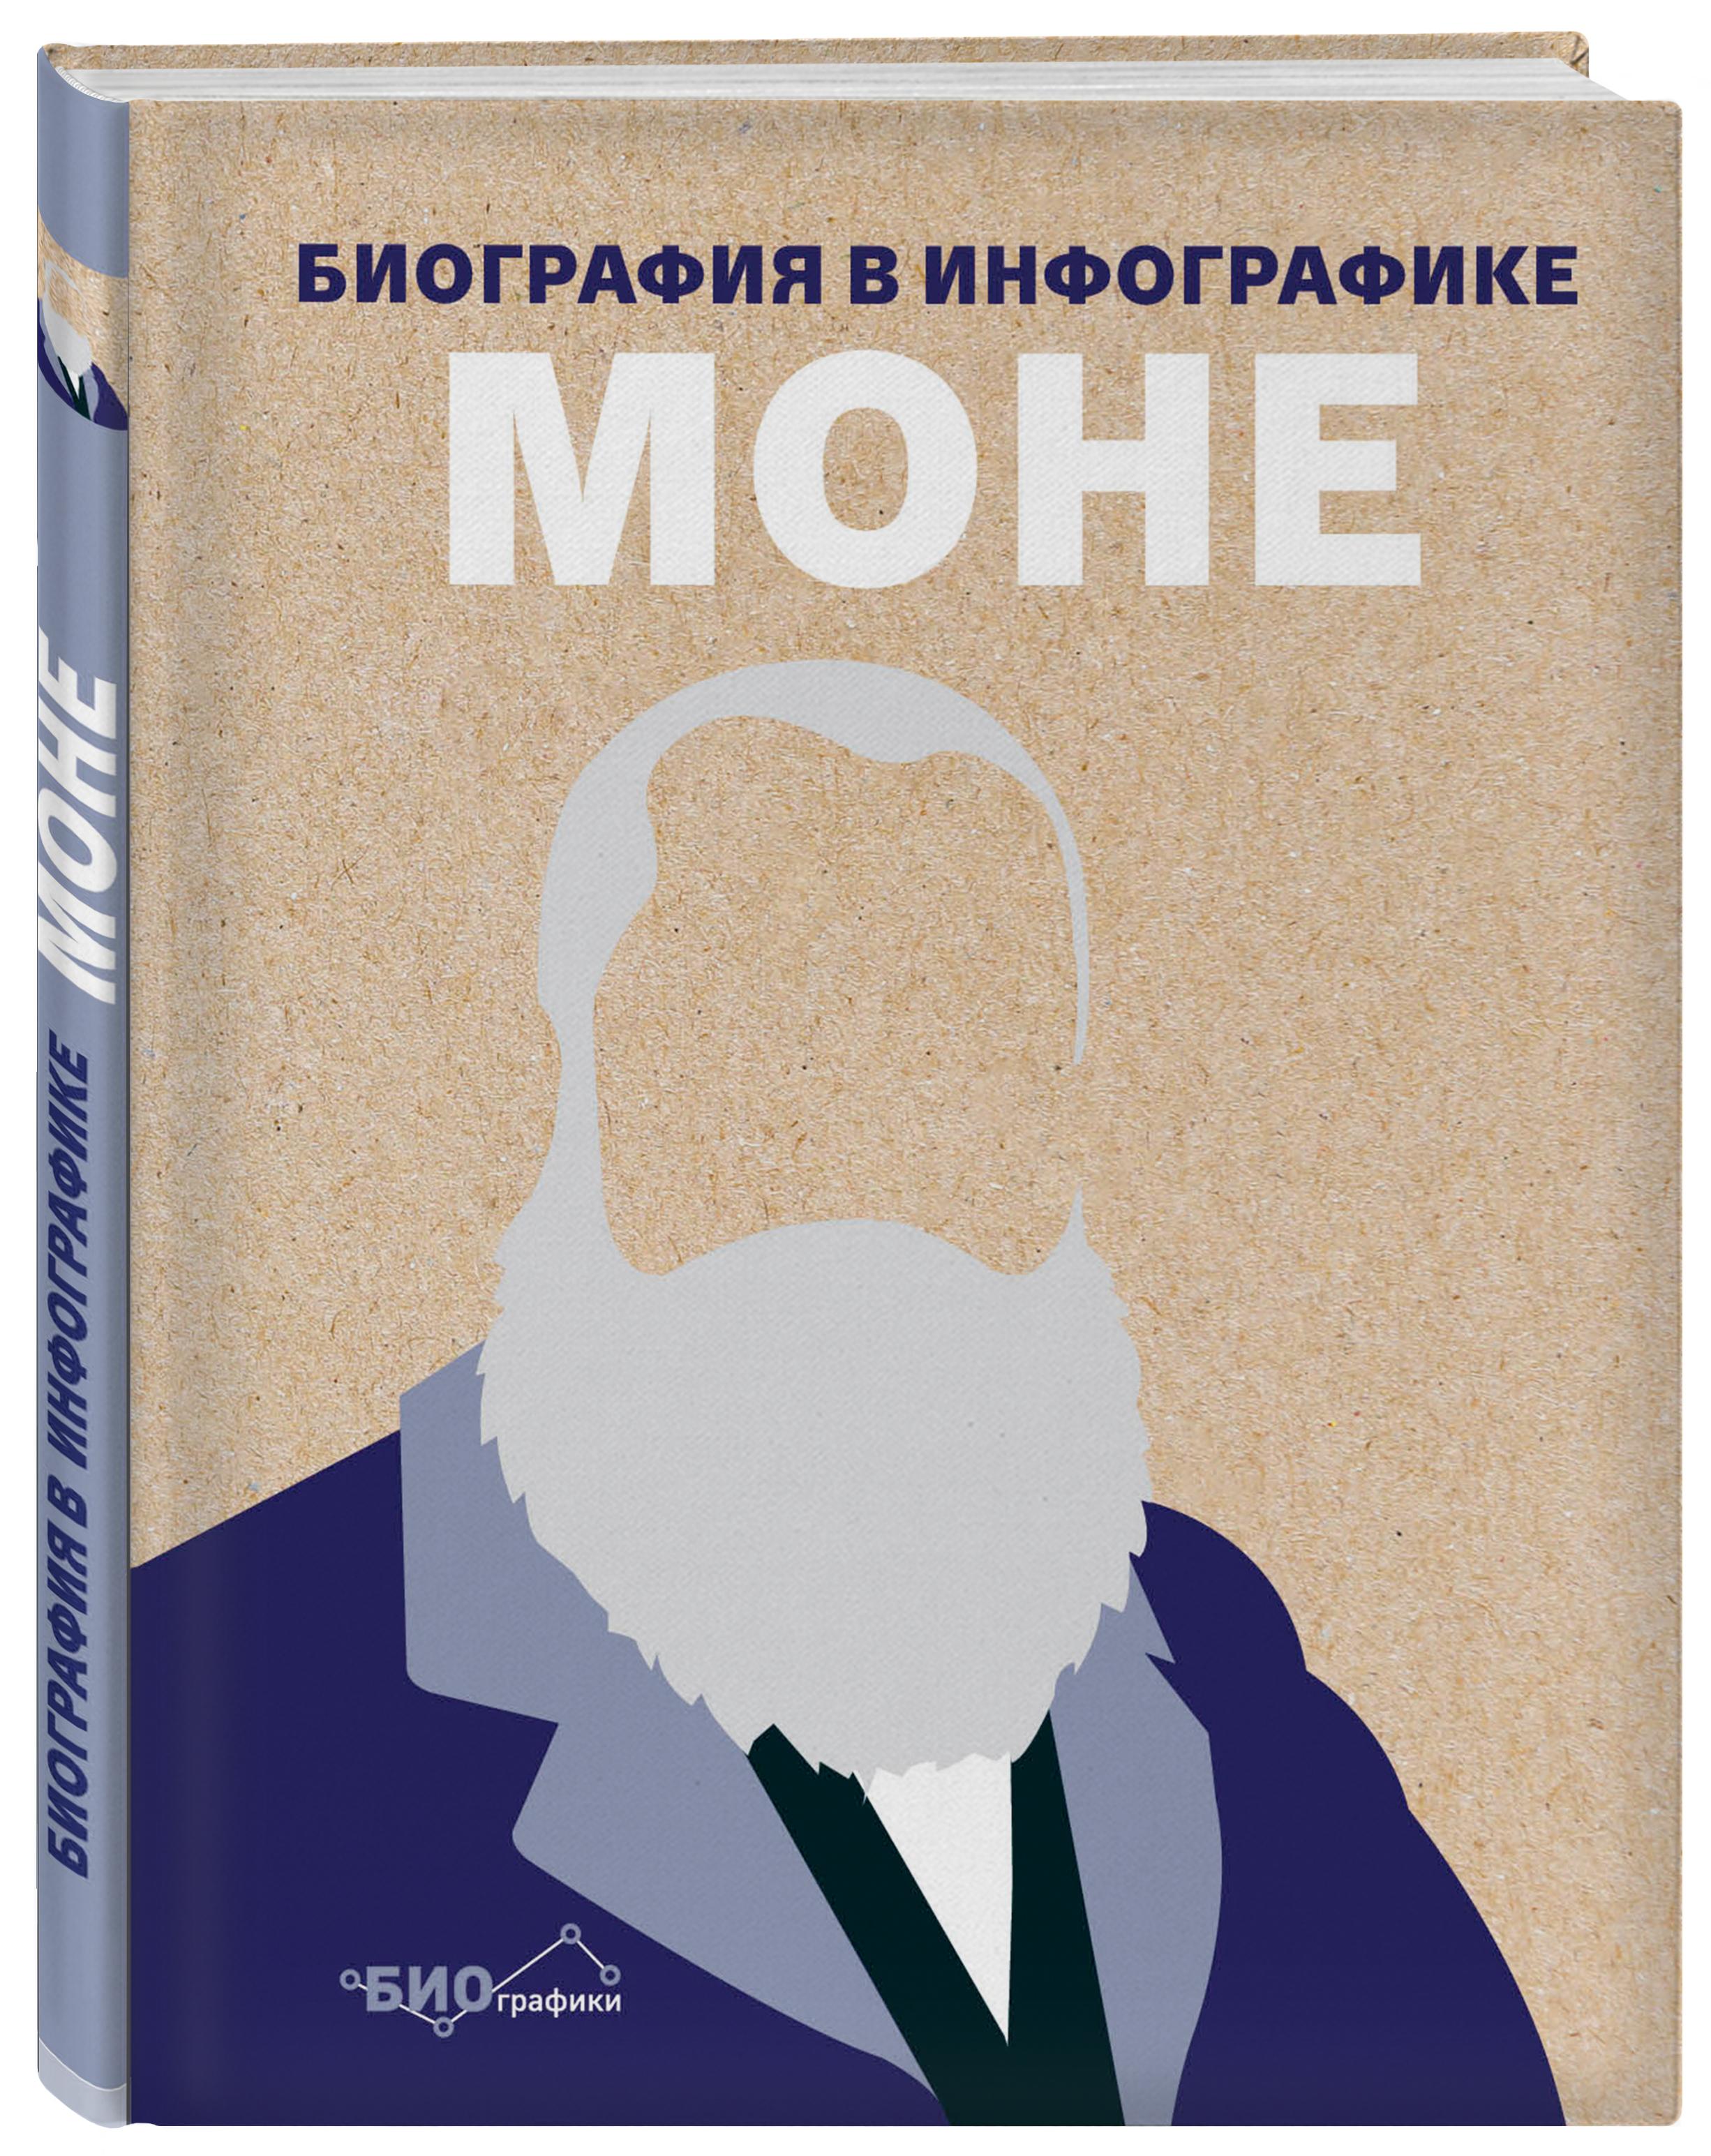 Моне. Биография в инфографике от book24.ru